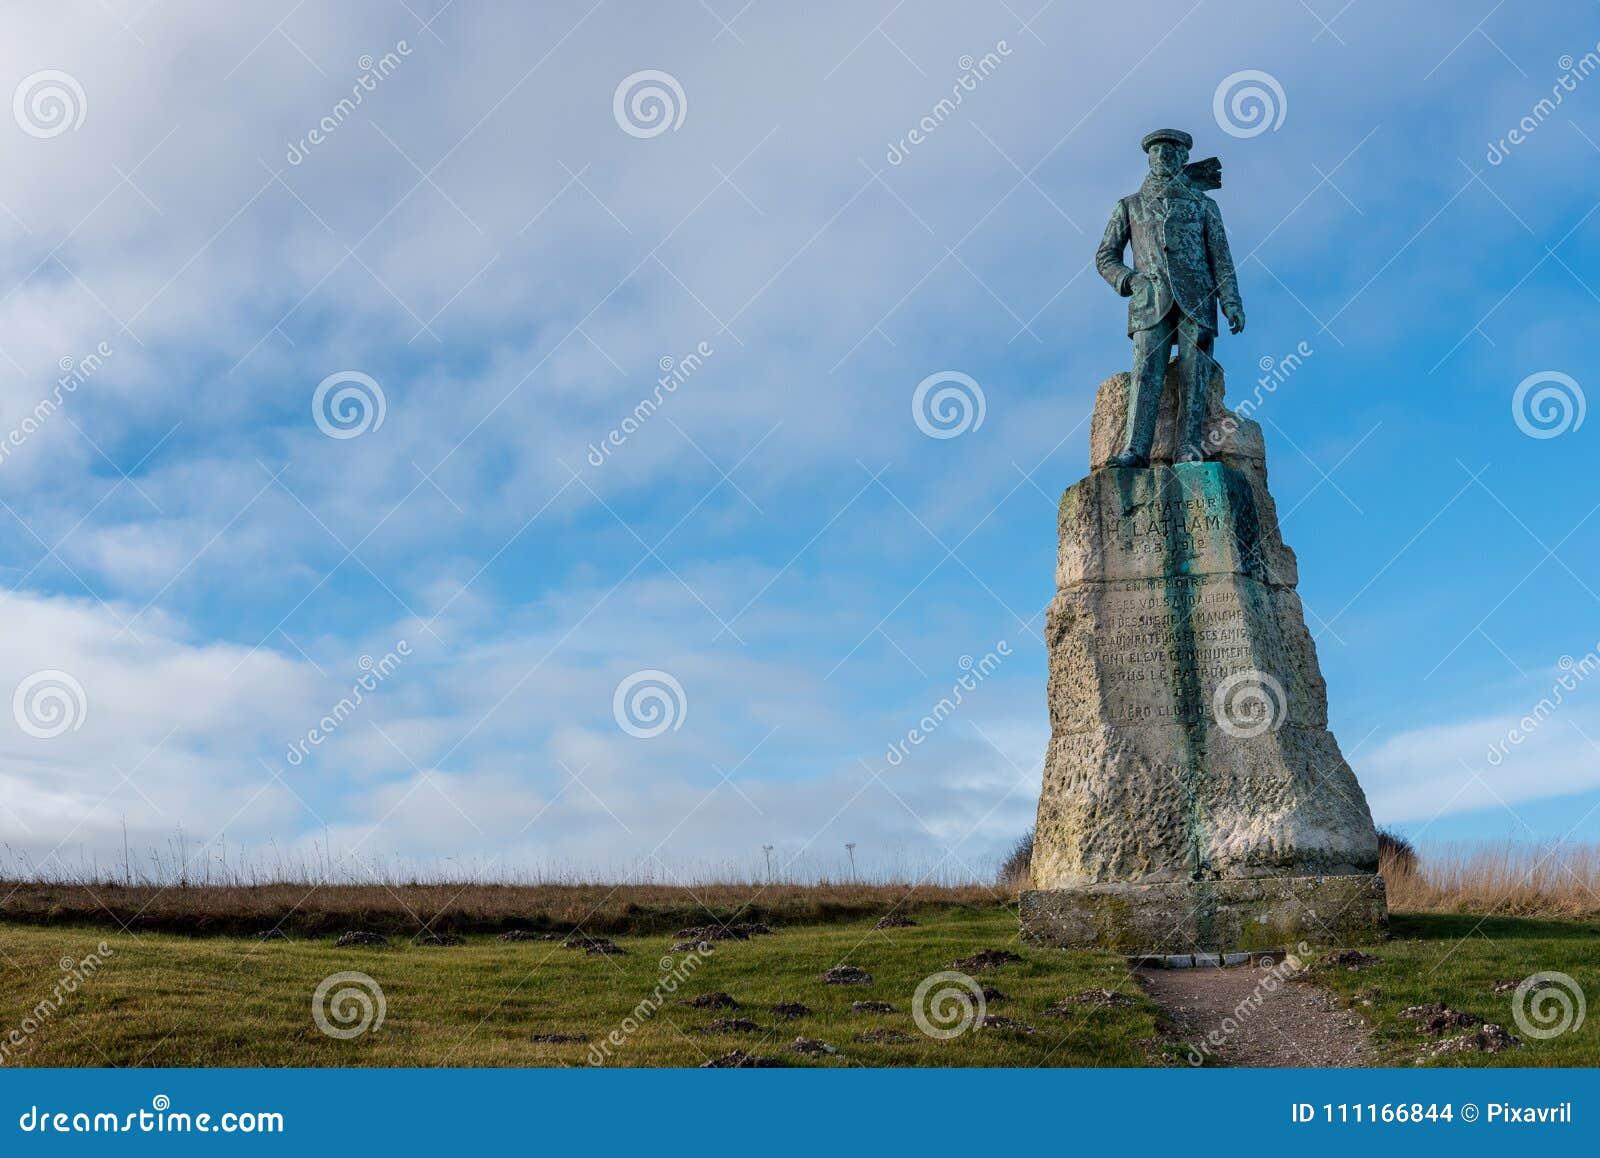 Statue of Hubert Latham, pioneering aviation